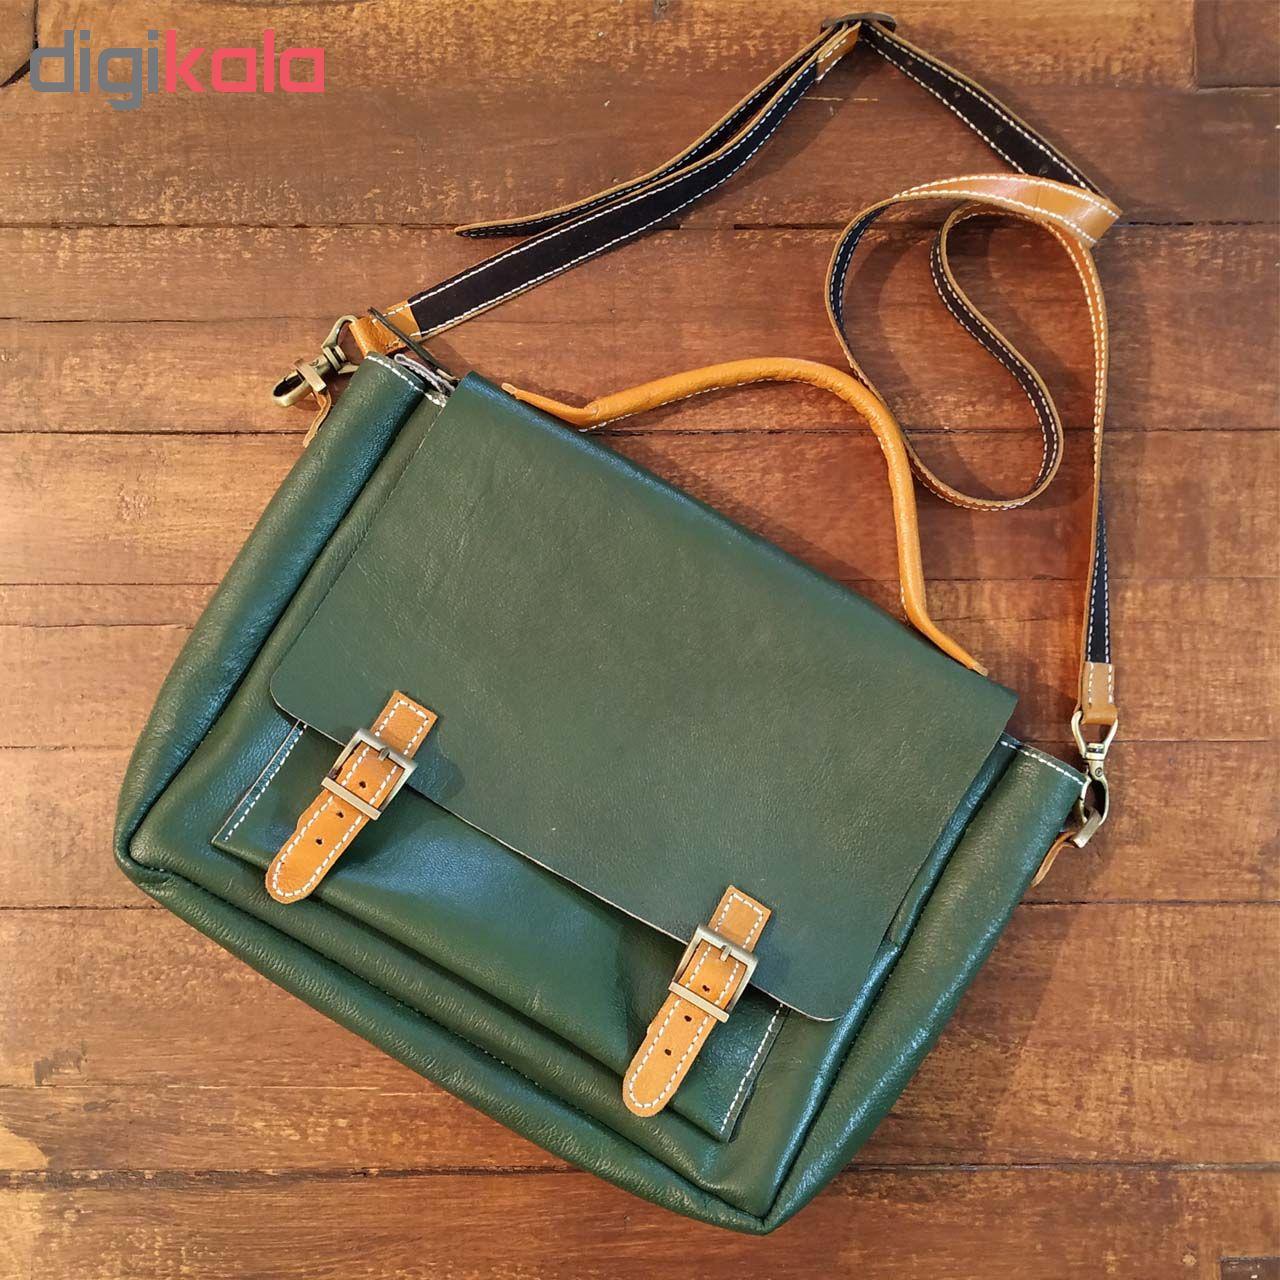 کیف چرمی کد 120